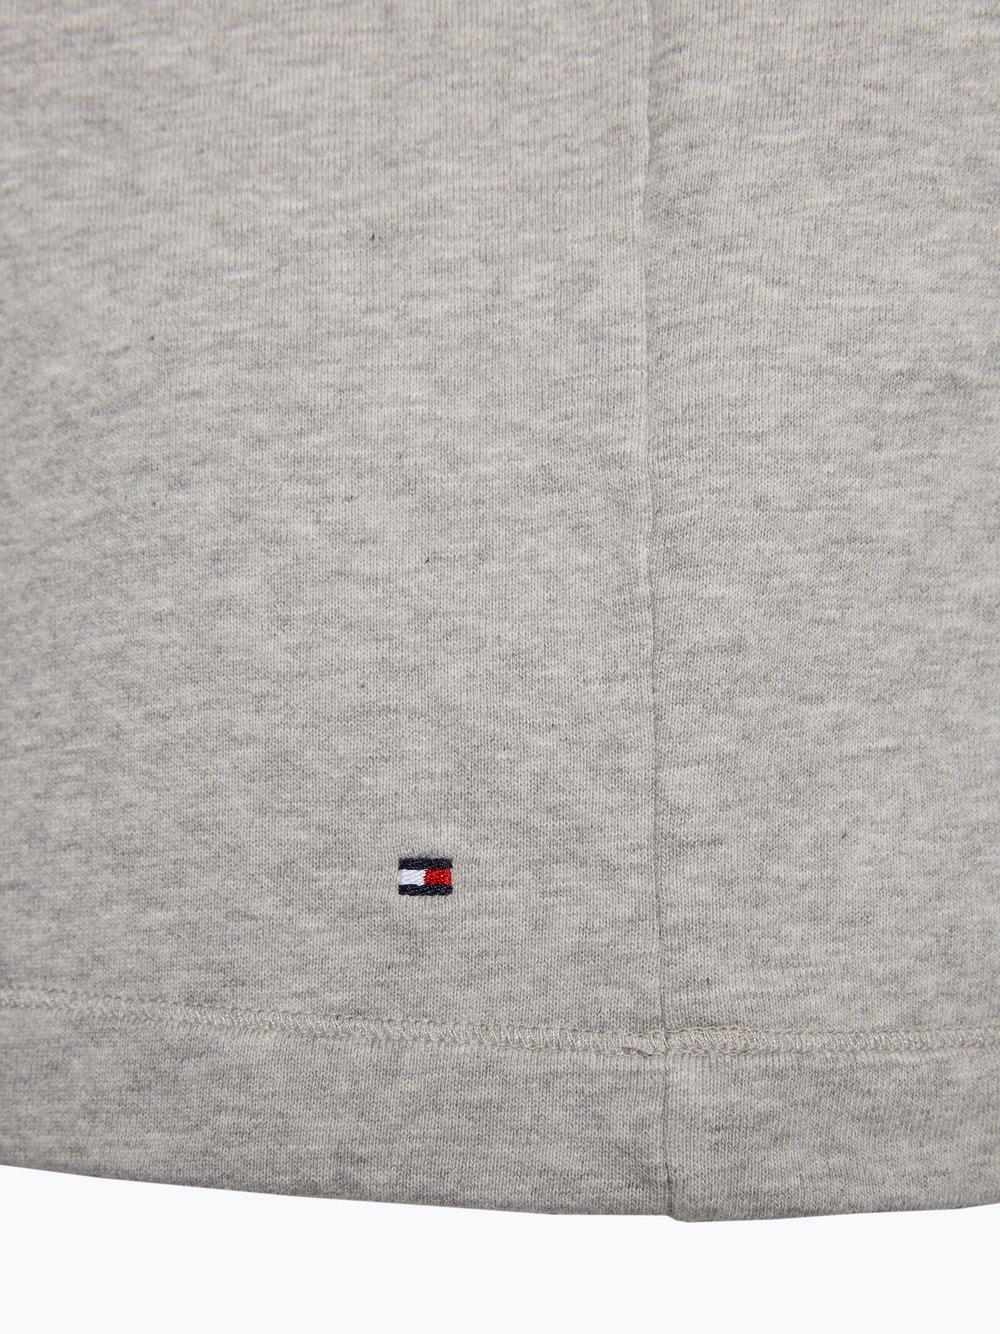 Tommy Hilfiger Damen Sweatshirt Dove online kaufen | PEEK